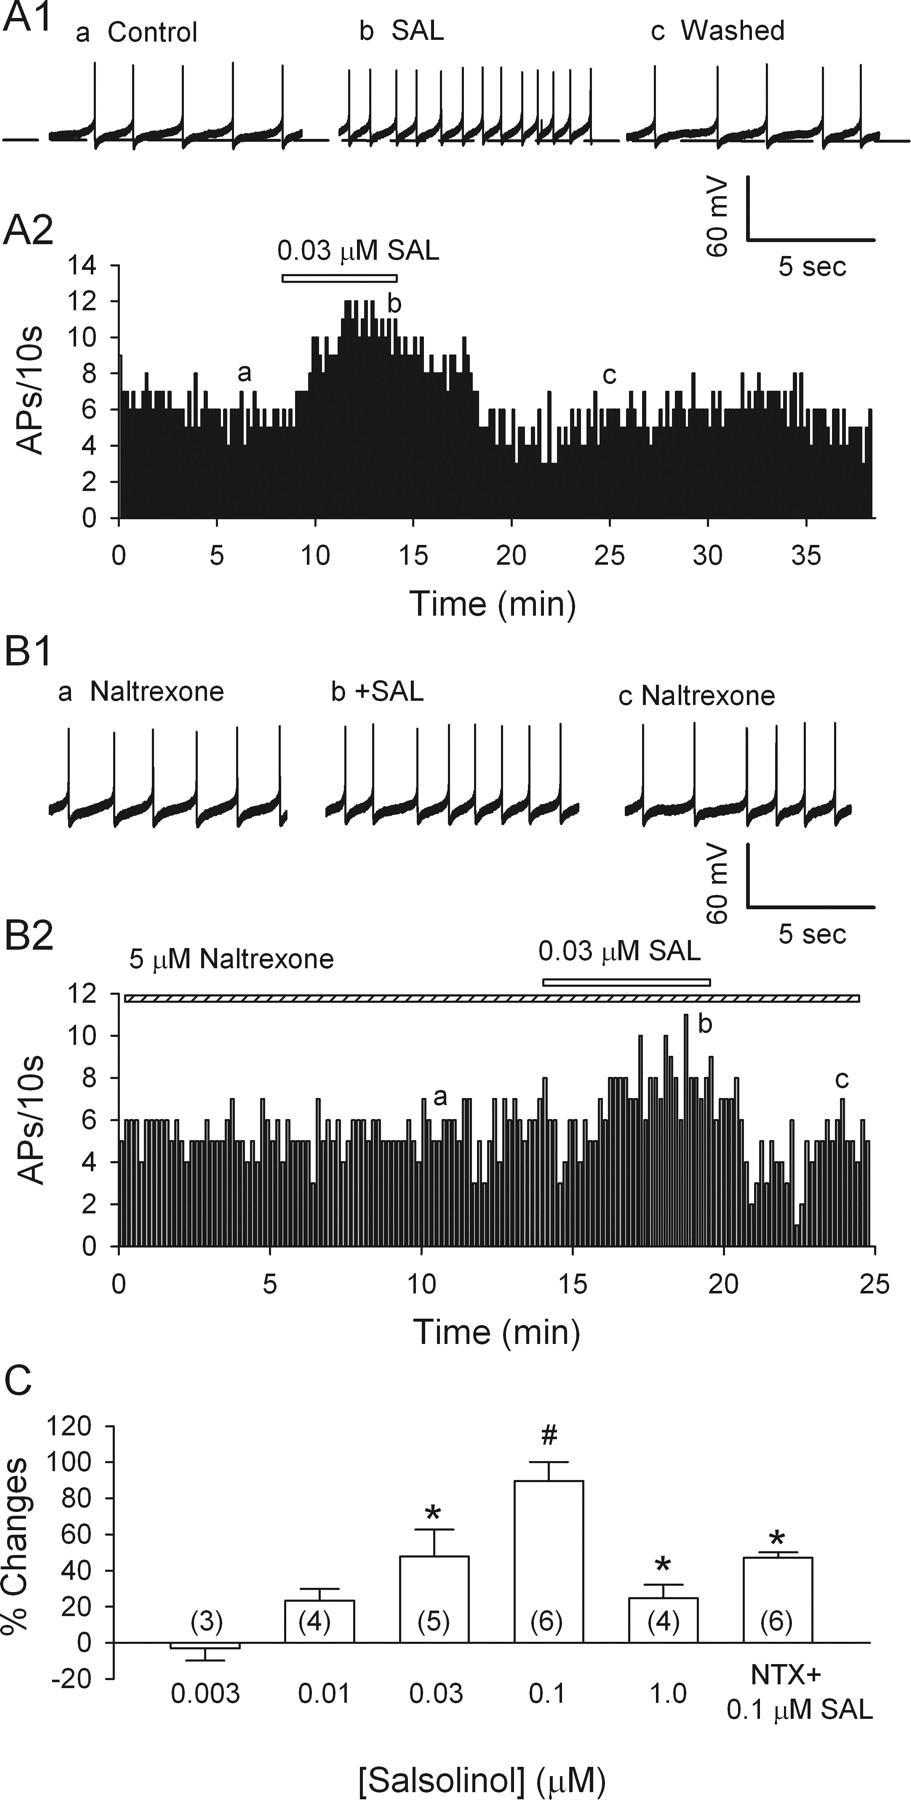 Salsolinol Stimulates Dopamine Neurons in Slices of Posterior